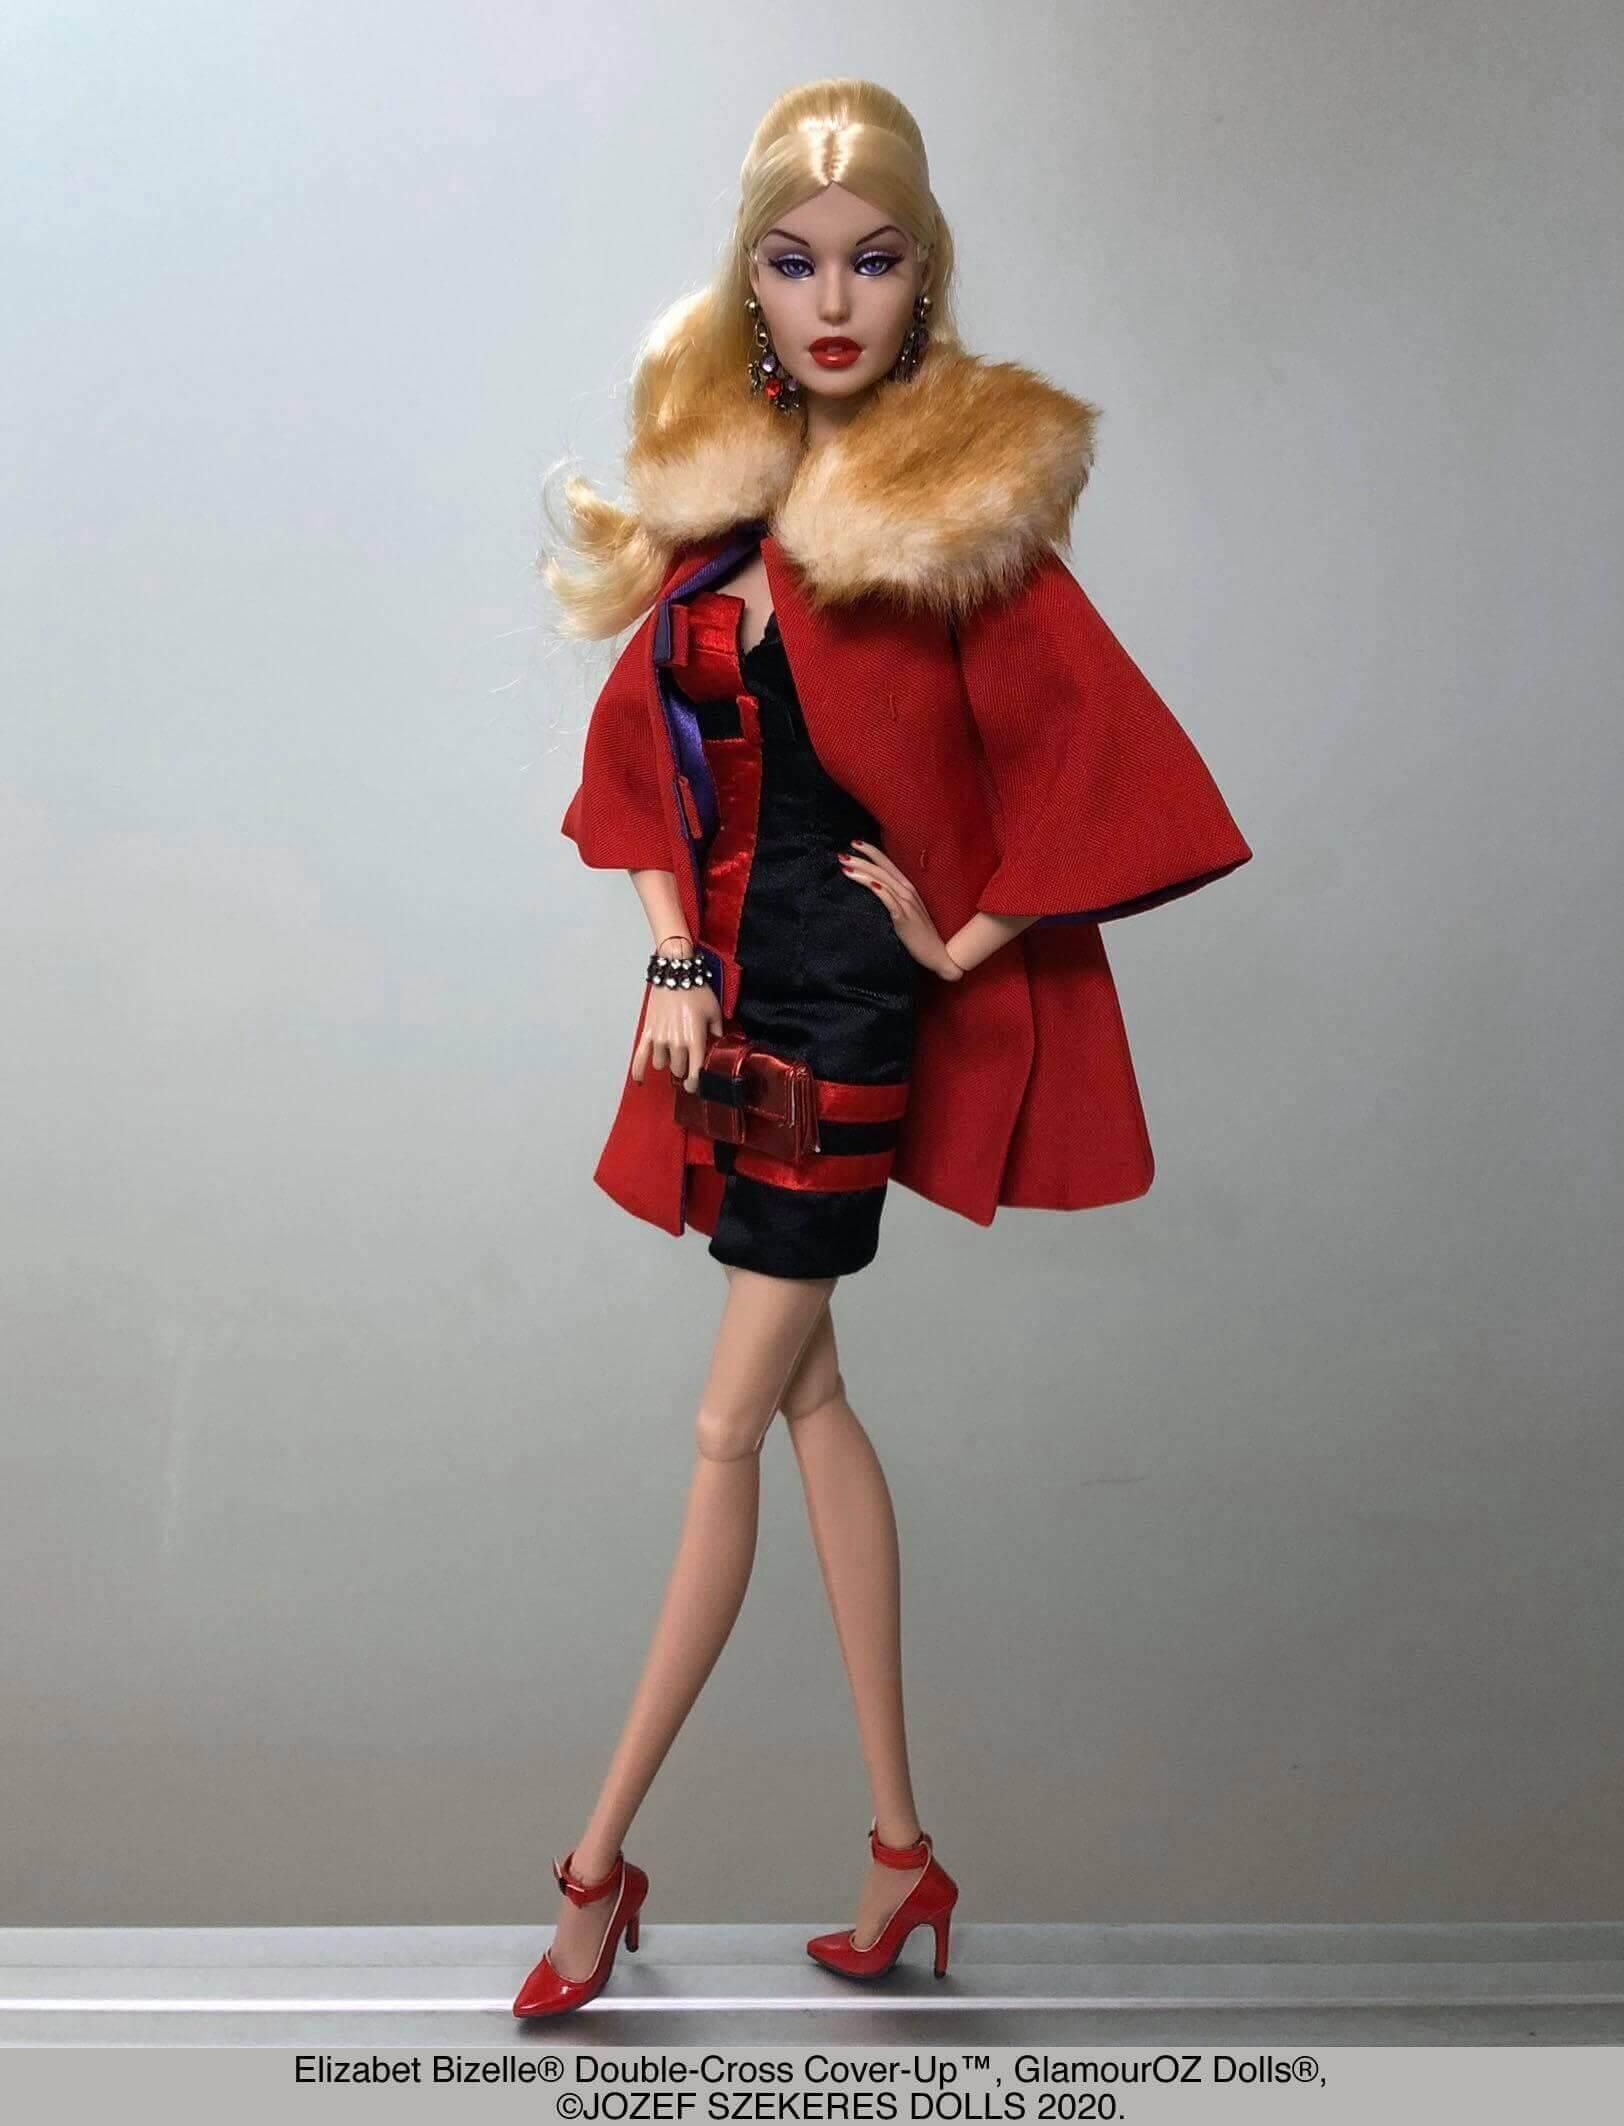 Glamouroz-Elizabet-Bizelle-Double-Cross-Cover-Up